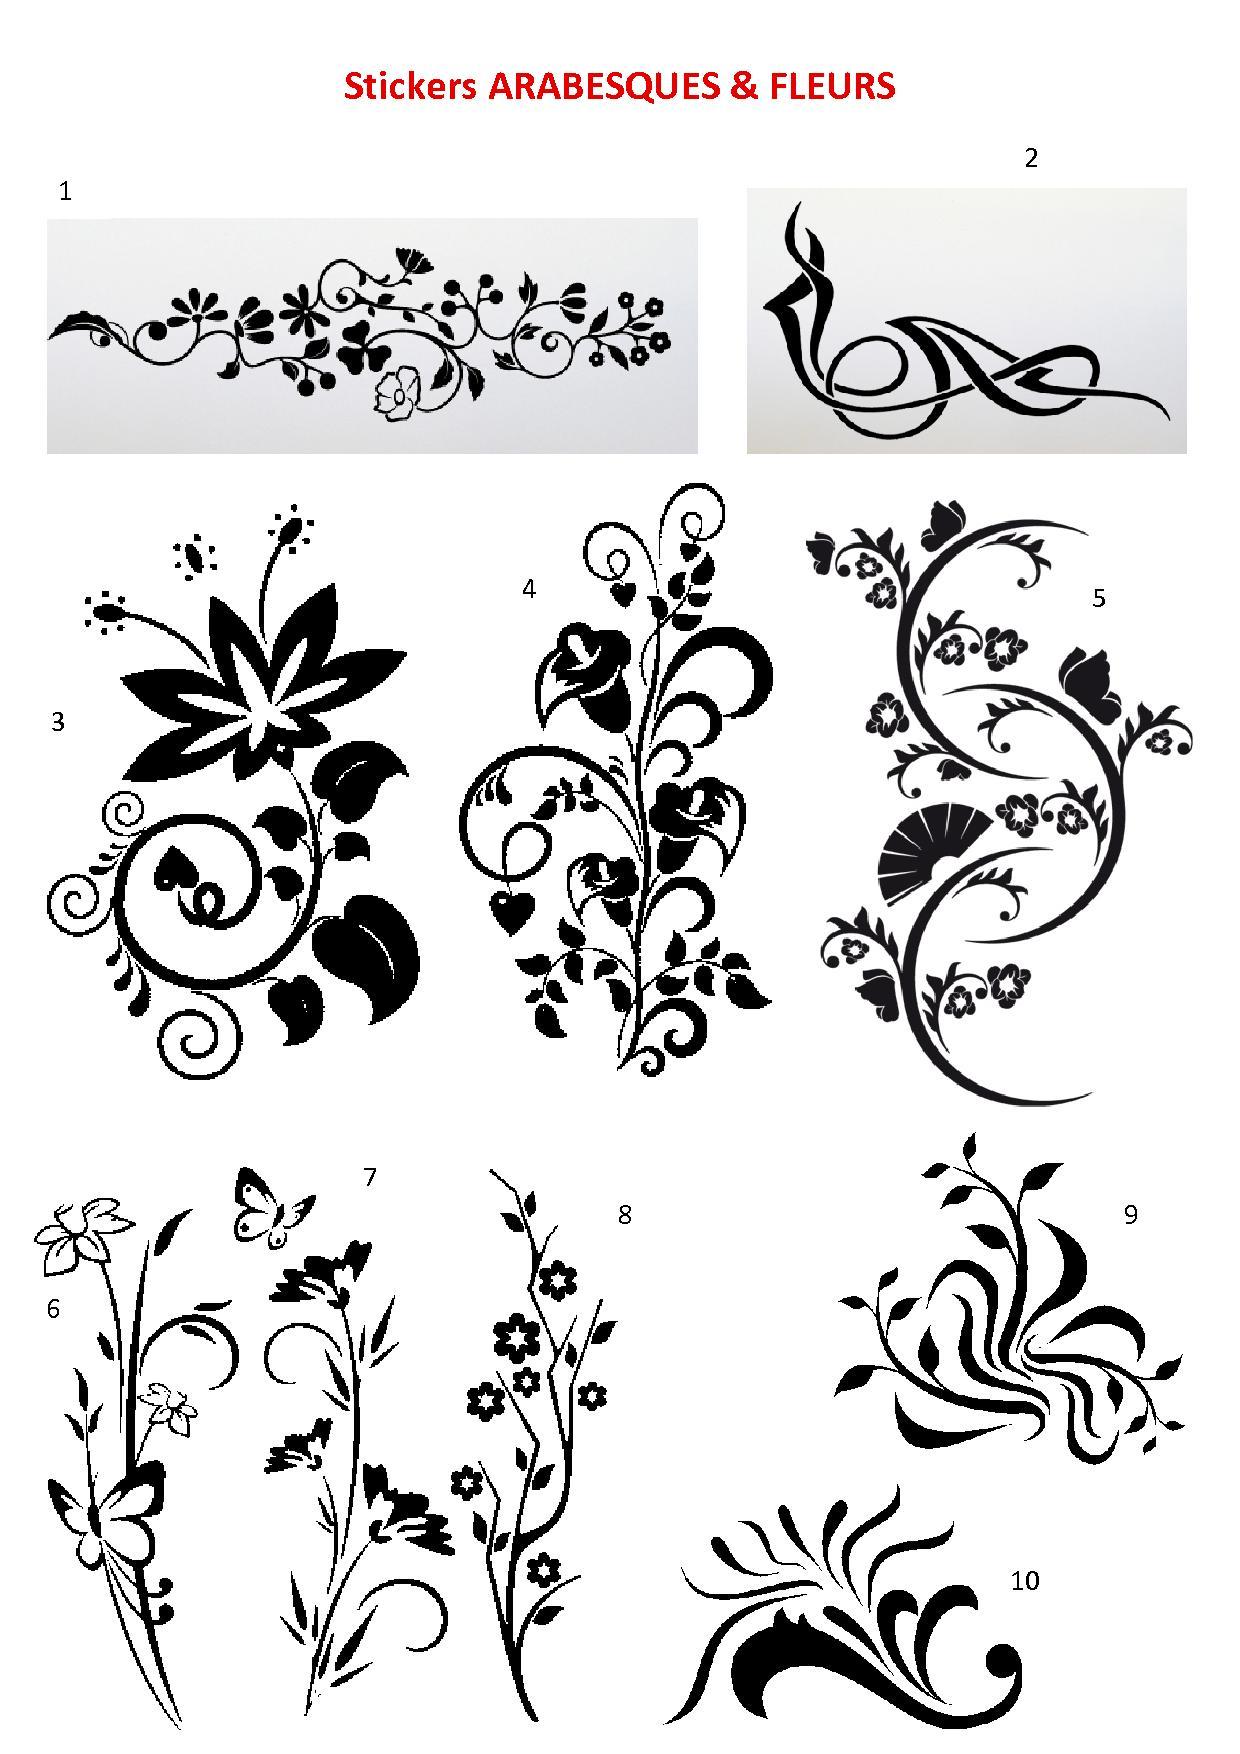 pin cheville arabesque femme motif tatouage modle tattoo on pinterest. Black Bedroom Furniture Sets. Home Design Ideas